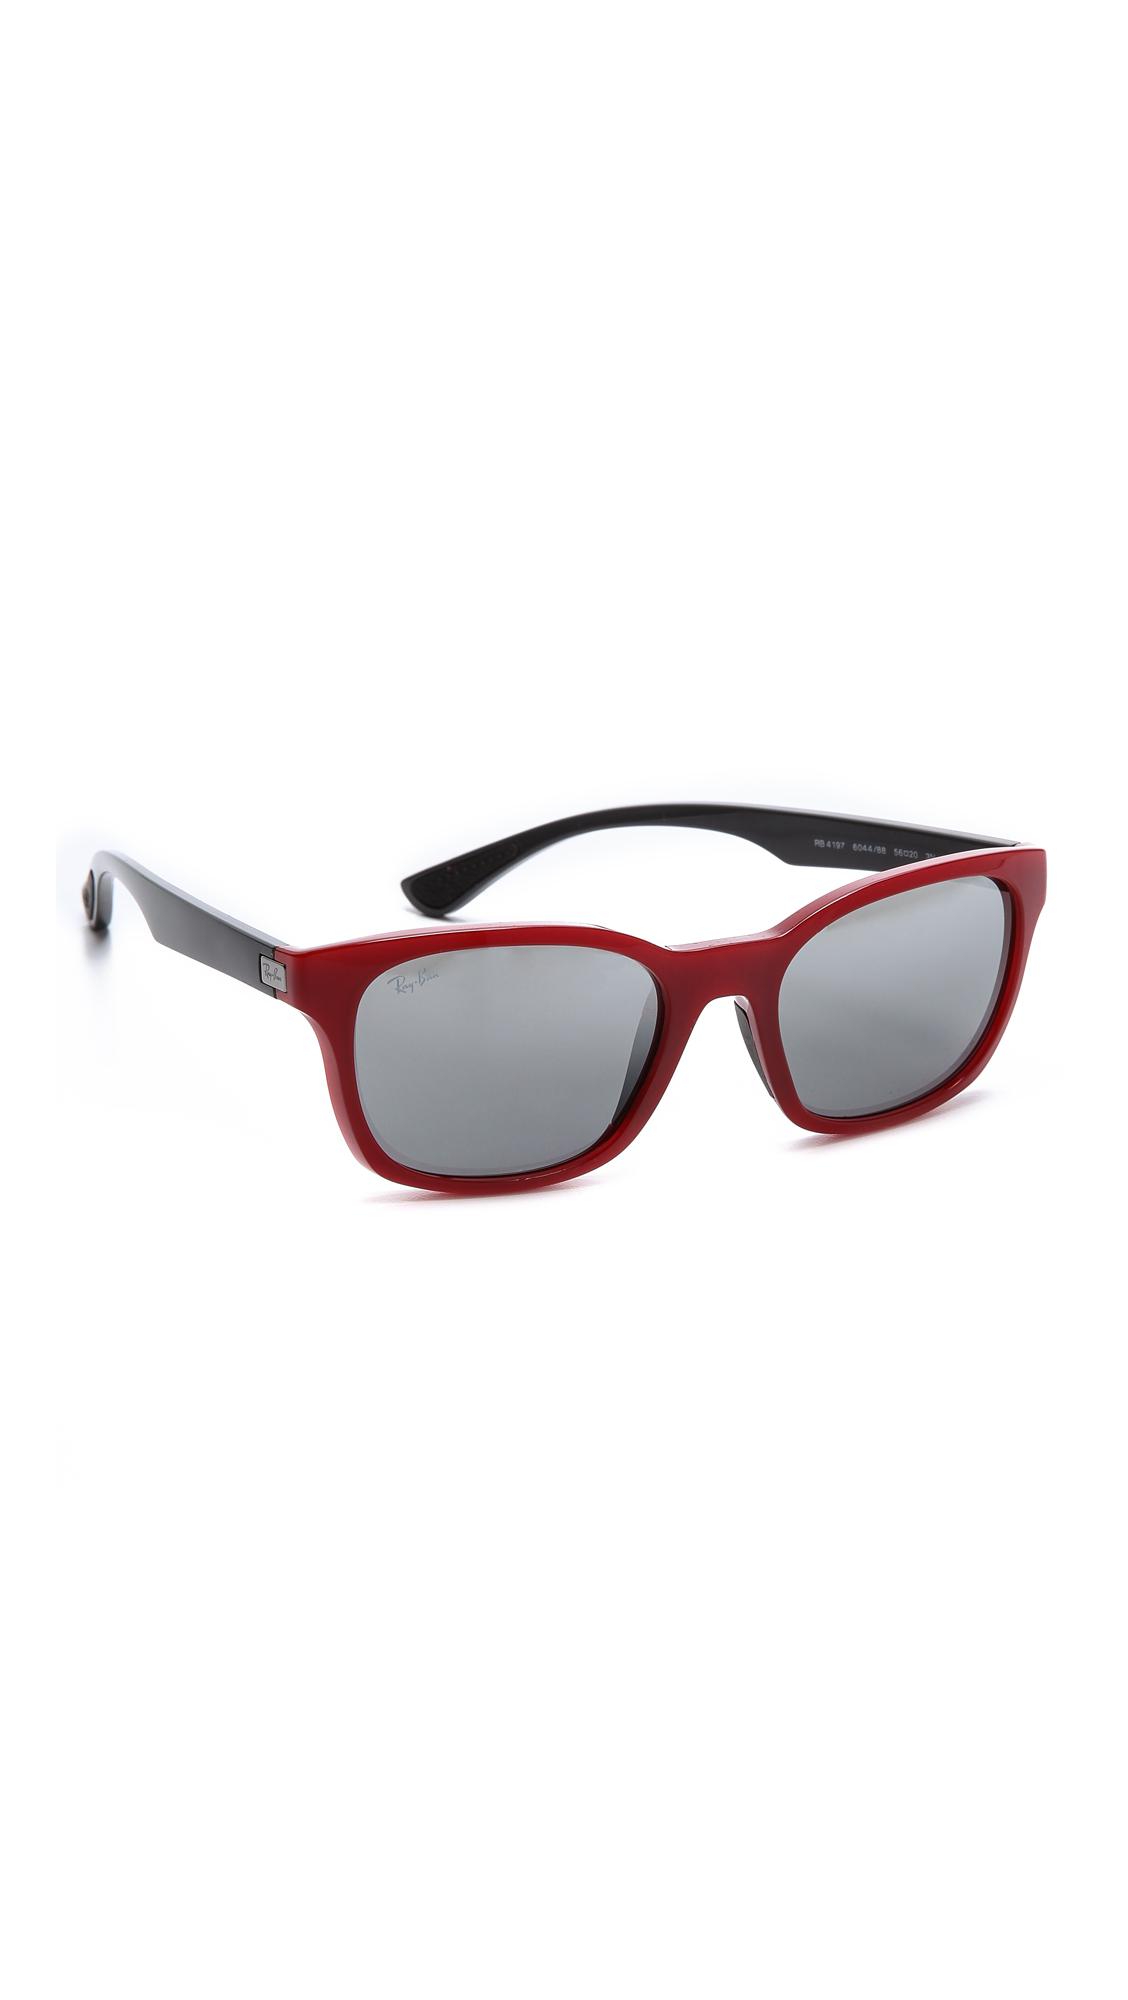 Ray Ban Oversized Square Sunglasses « Heritage Malta